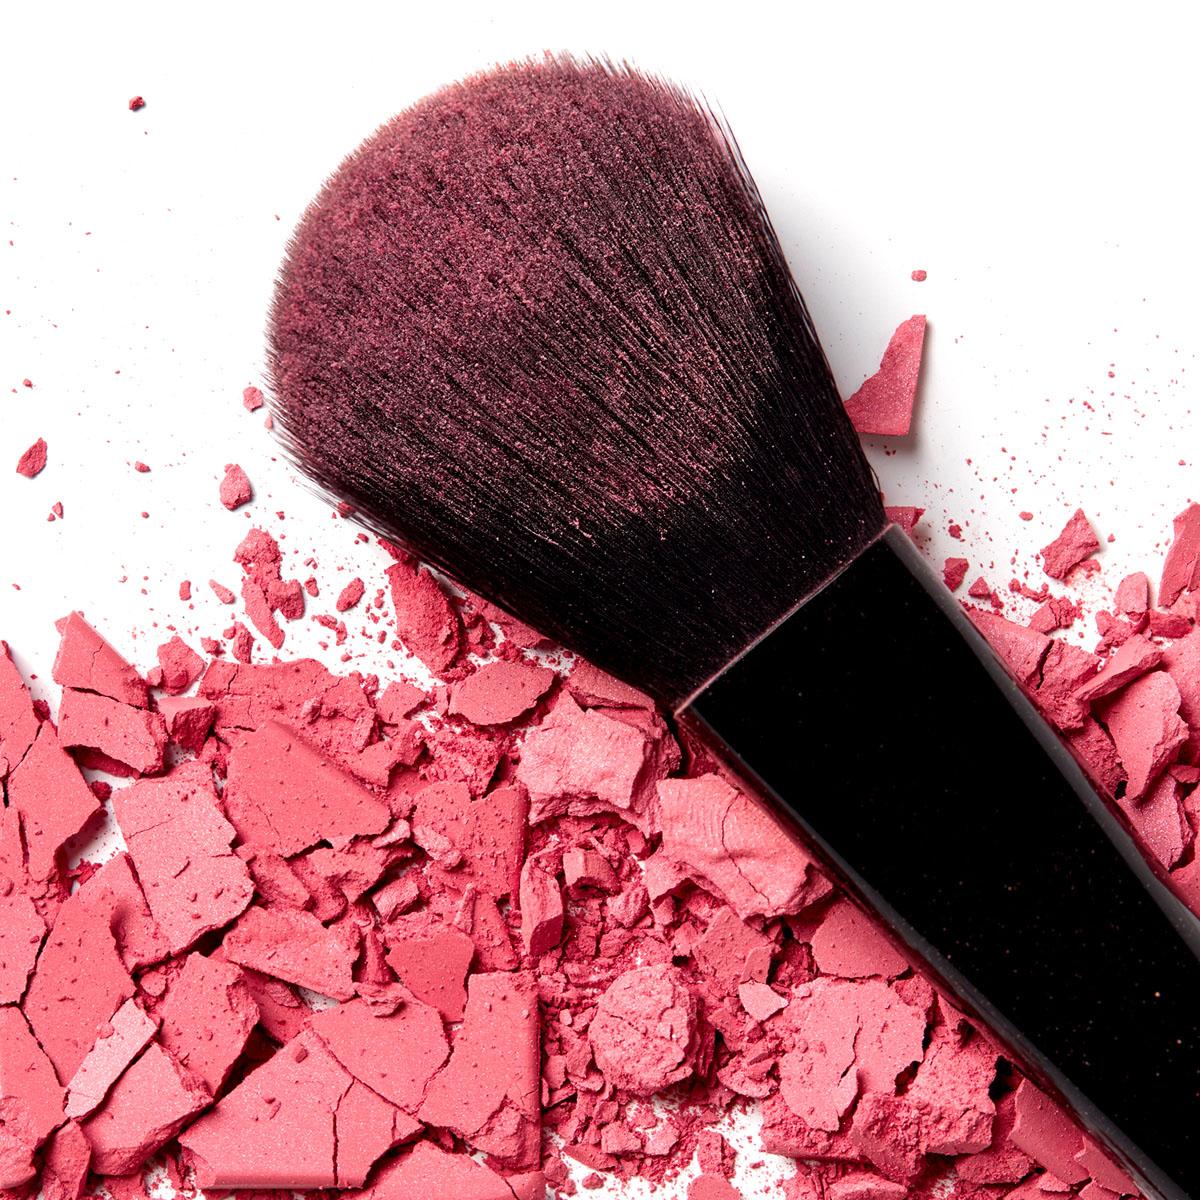 beautymarketing Silva Nigra Werbeagentur